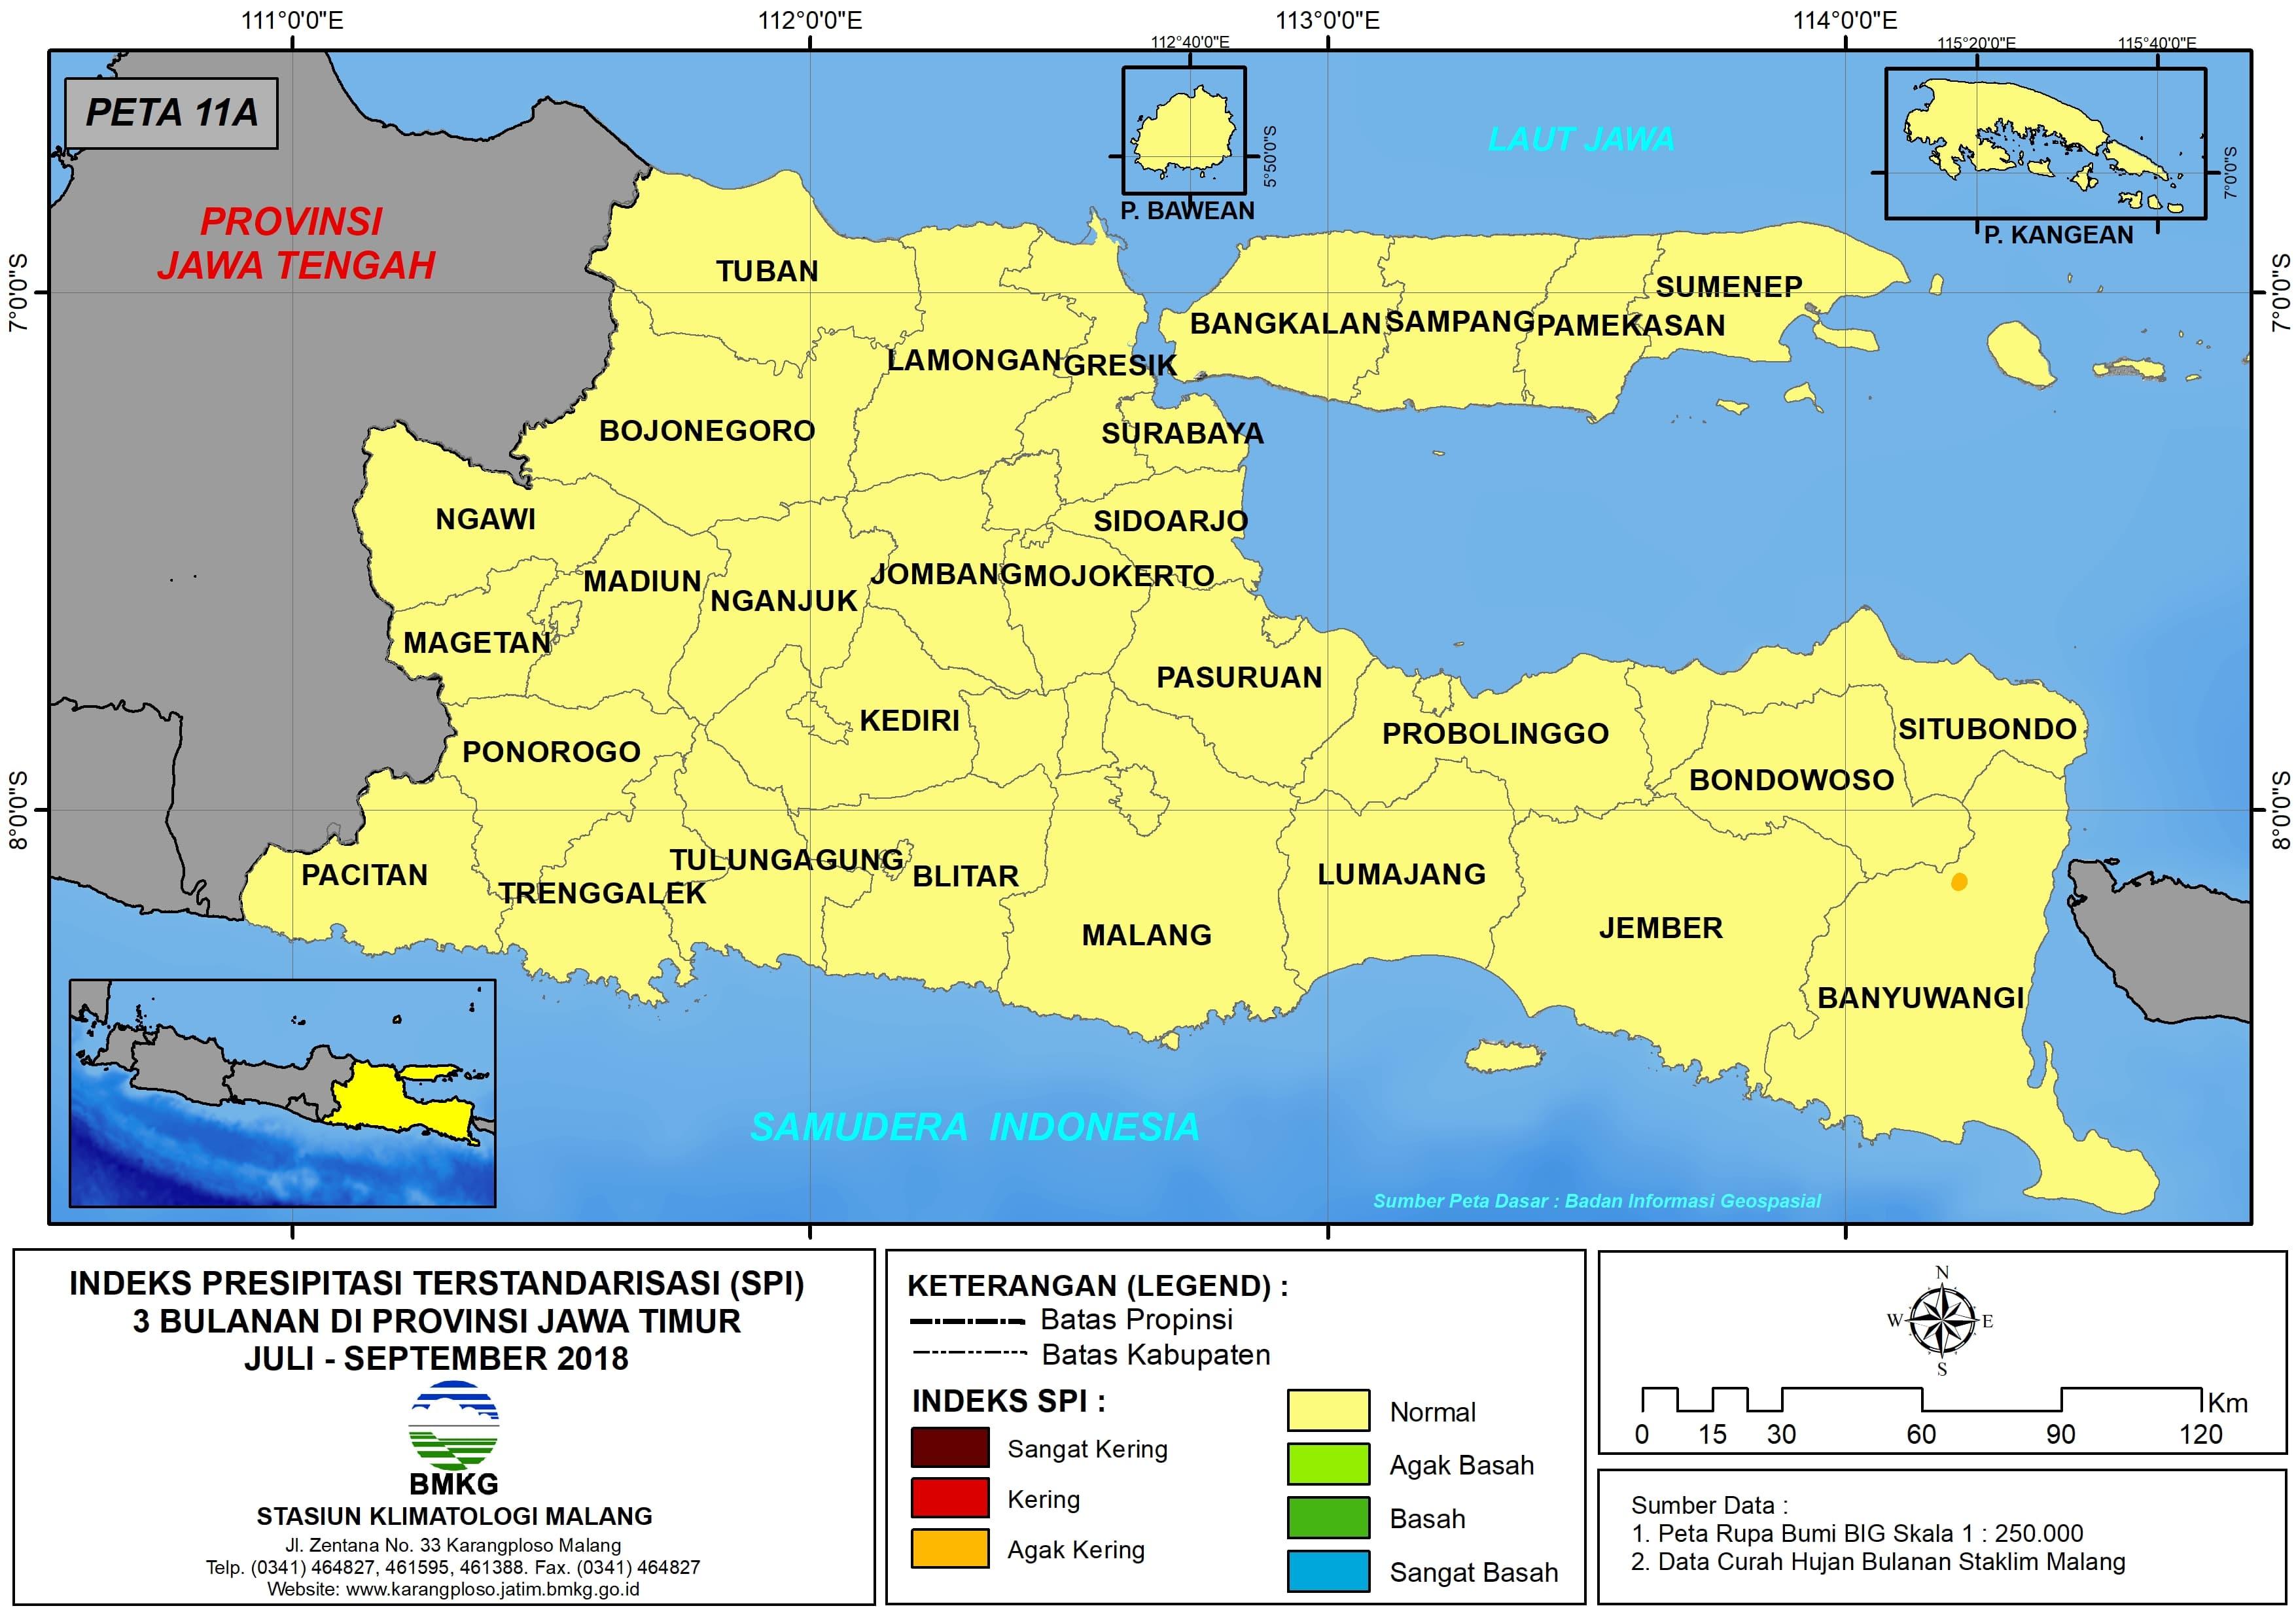 Analisis Indeks Presipitasi Terstandarisasi SPI 3 Bulanan Untuk Bulan Juli Agustus September Tahun 2018 di Provinsi Jawa Timur